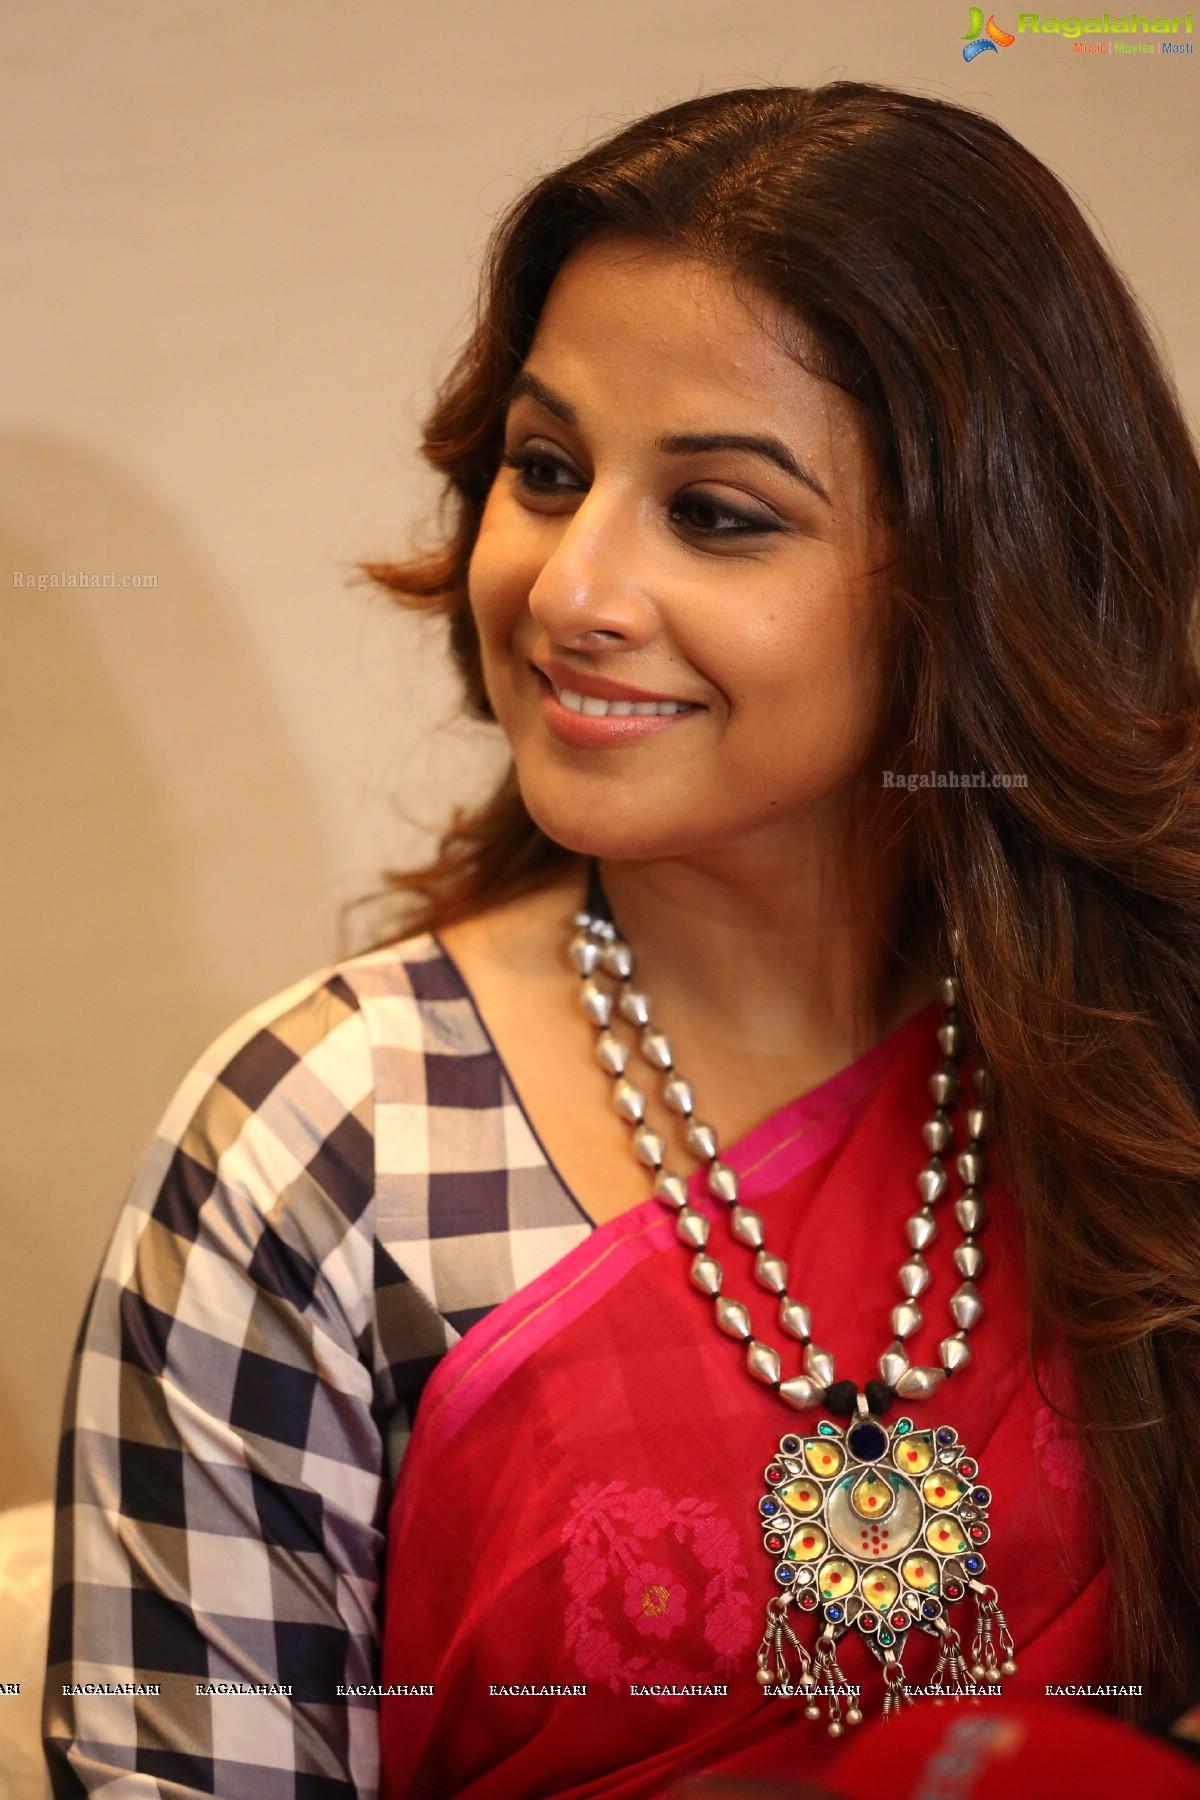 vidya balan image 55 | tollywood actress hot images,images, pics